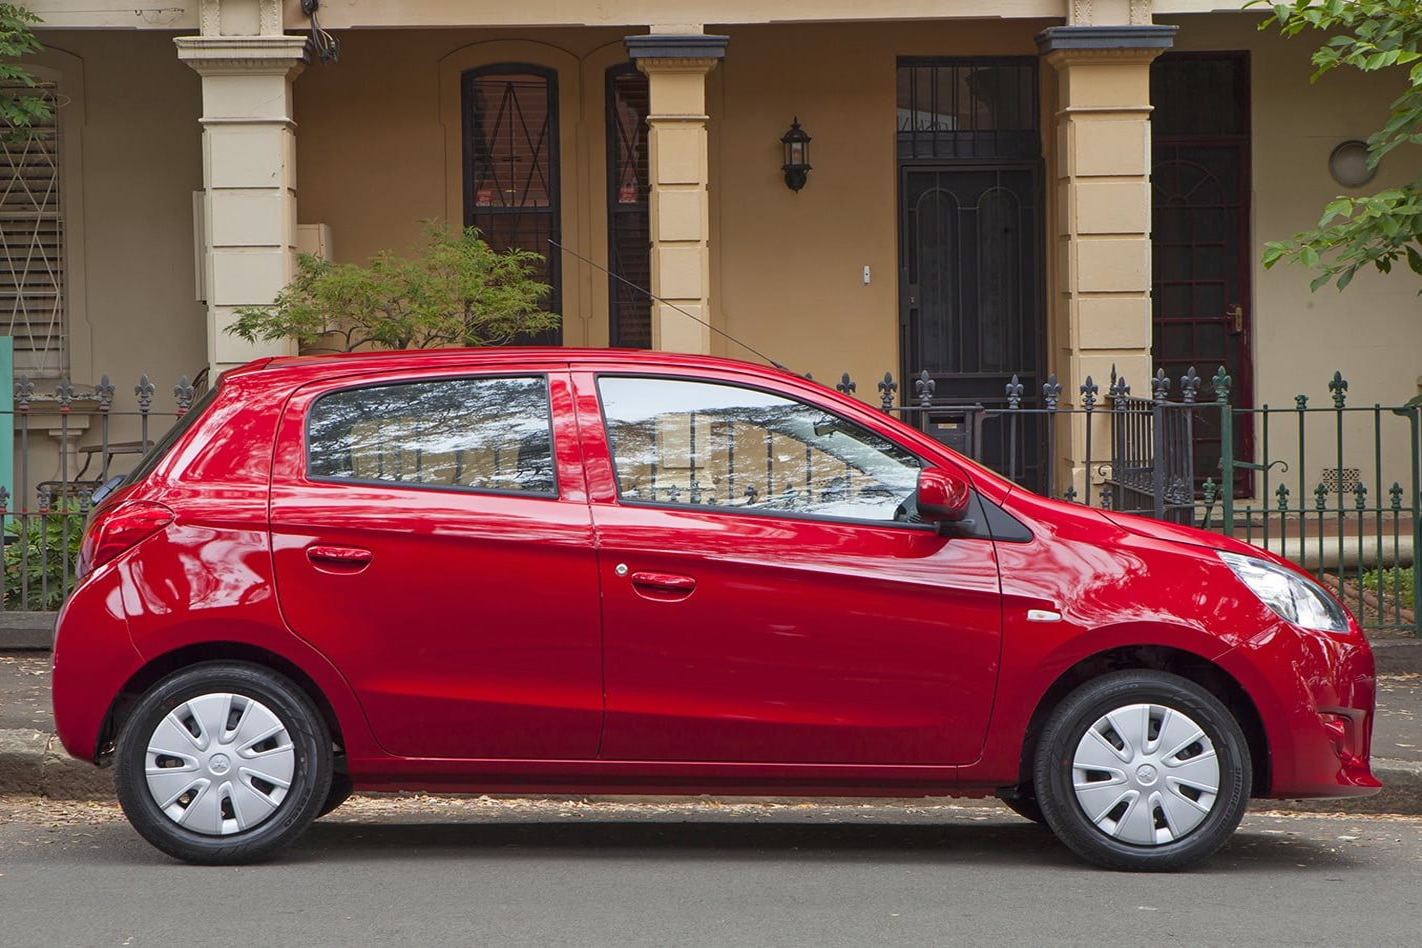 2017 Mitsubishi Mirage takes title as Australia's cheapest auto-equipped car